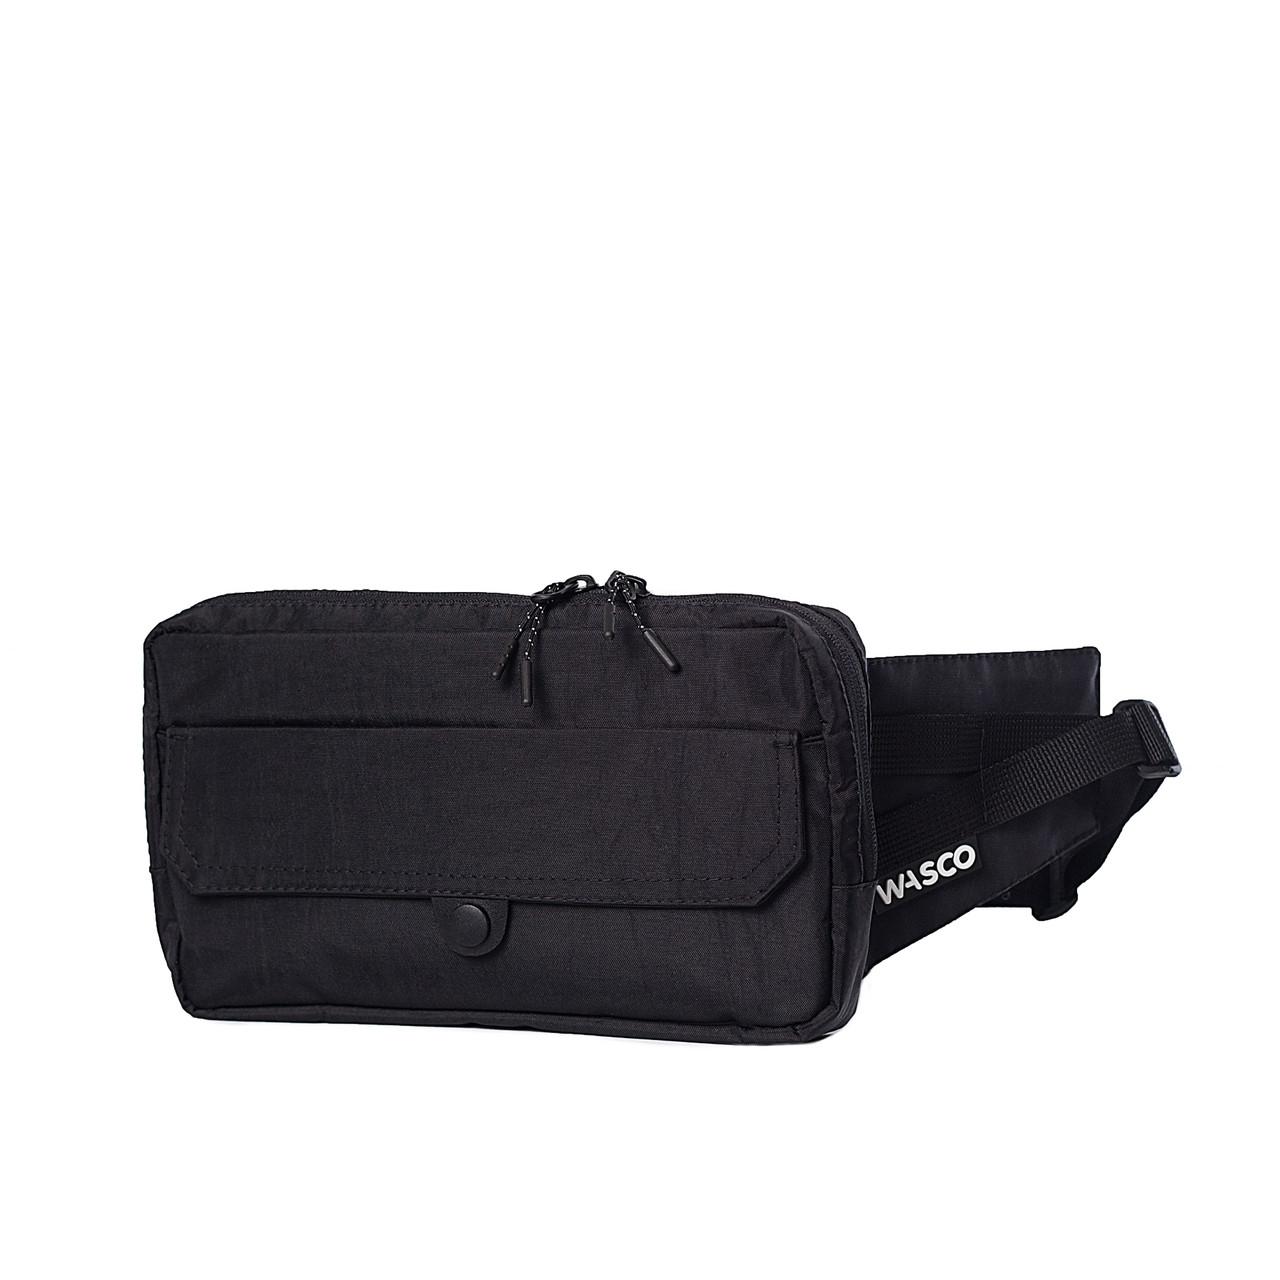 Поясная сумка Wasco G1 Черная